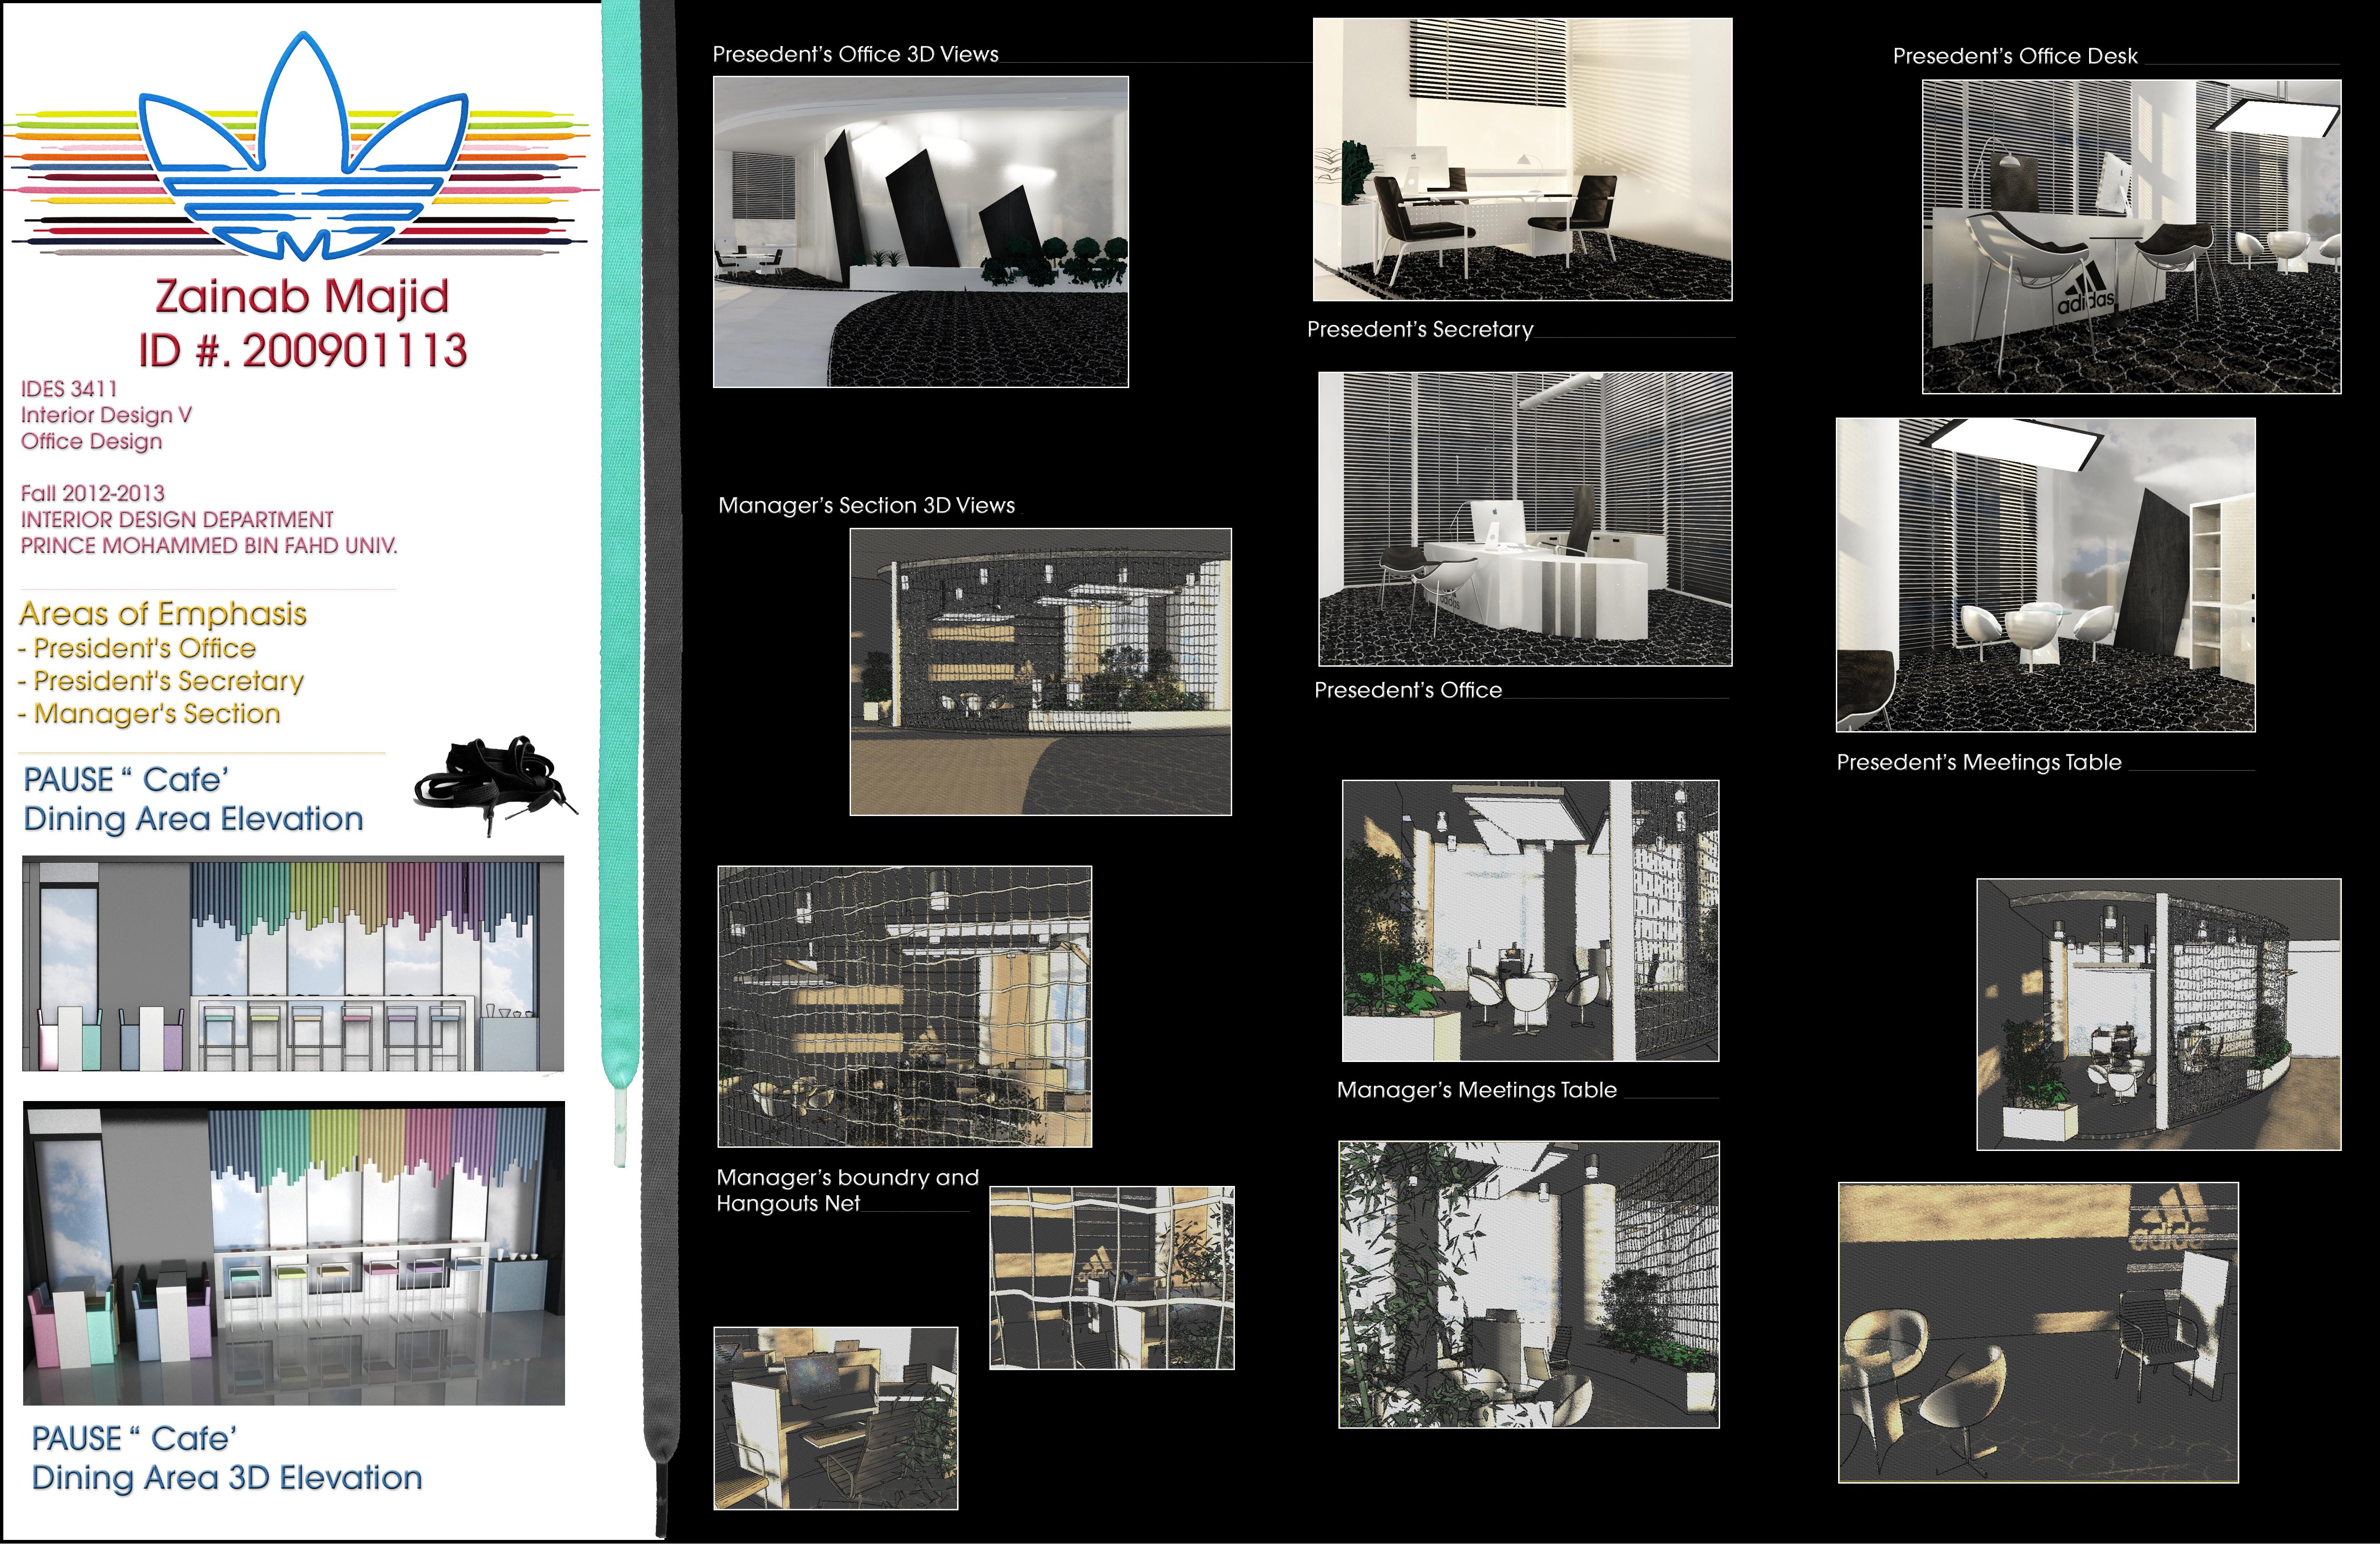 Interior Design V – Zainab Majid